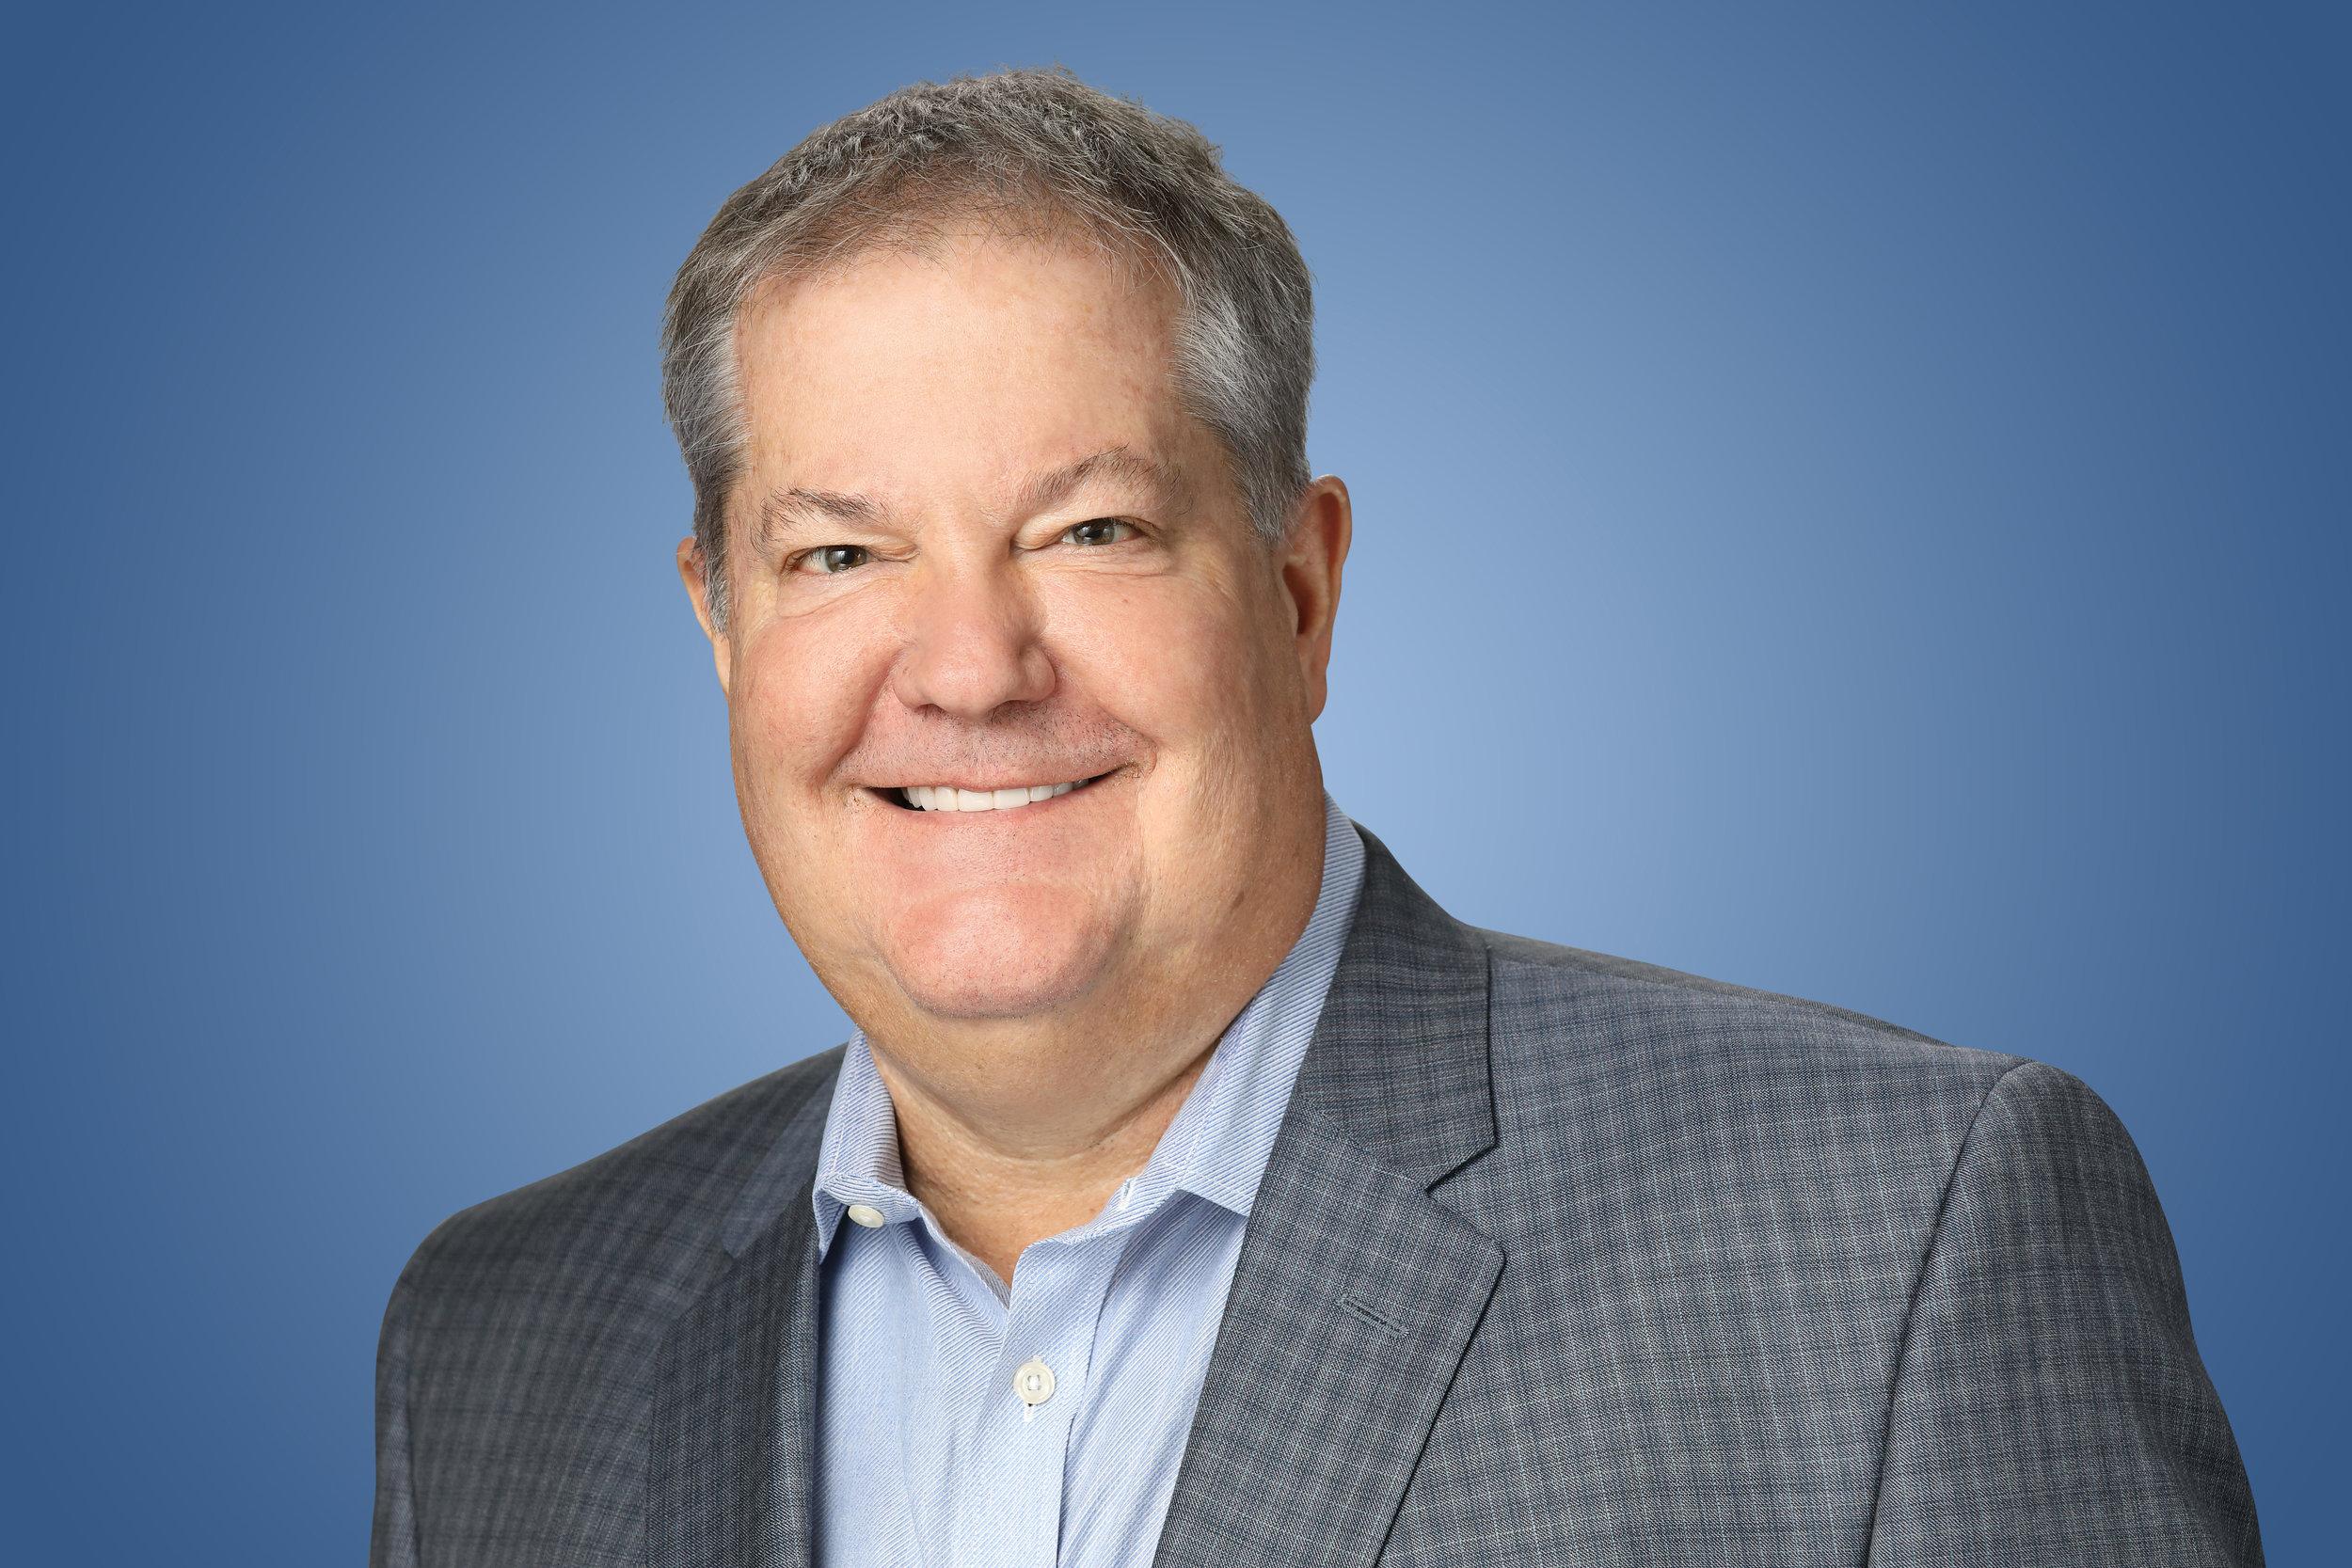 DT Minich - EK President CEO_headshot.jpg